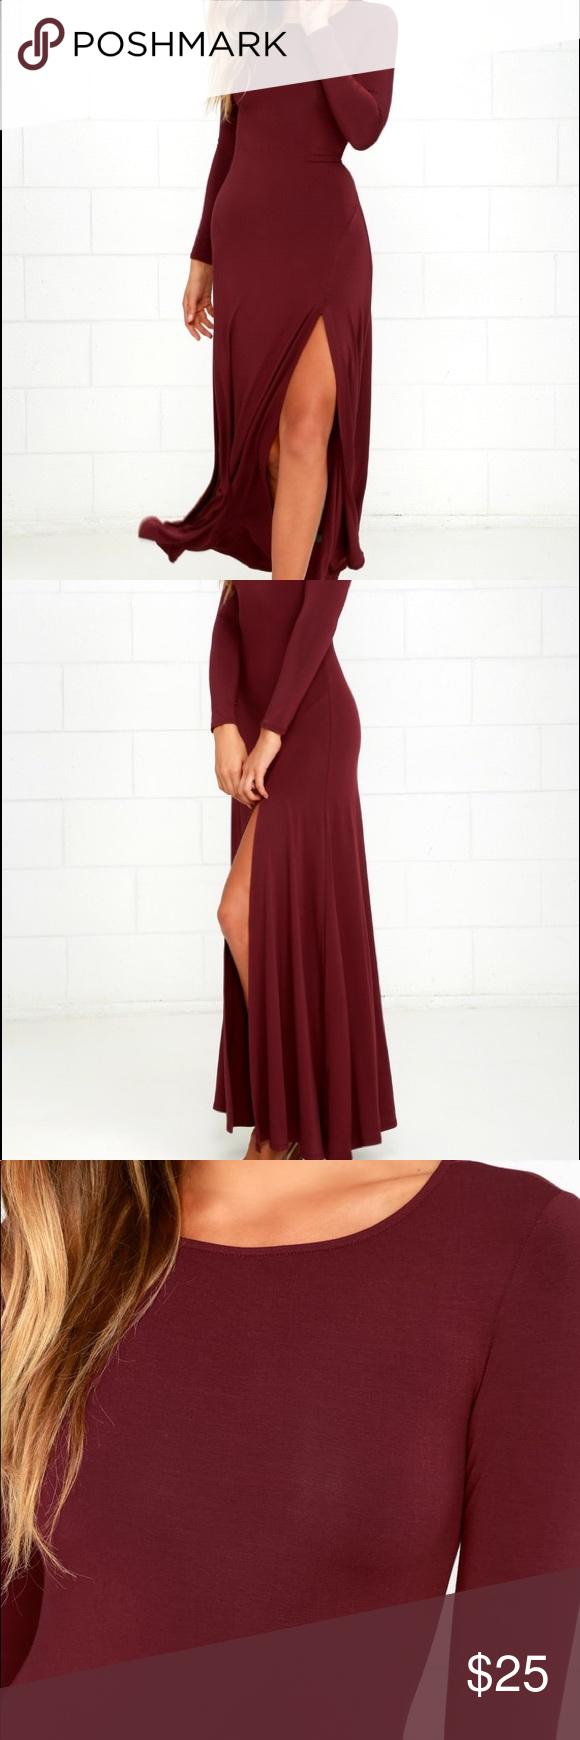 Lulu Swept Away Burgundy Maxi Long Sleeve Dress Long Sleeve Maxi Dress Maxi Dress With Sleeves Burgundy Maxi Dress [ 1740 x 580 Pixel ]